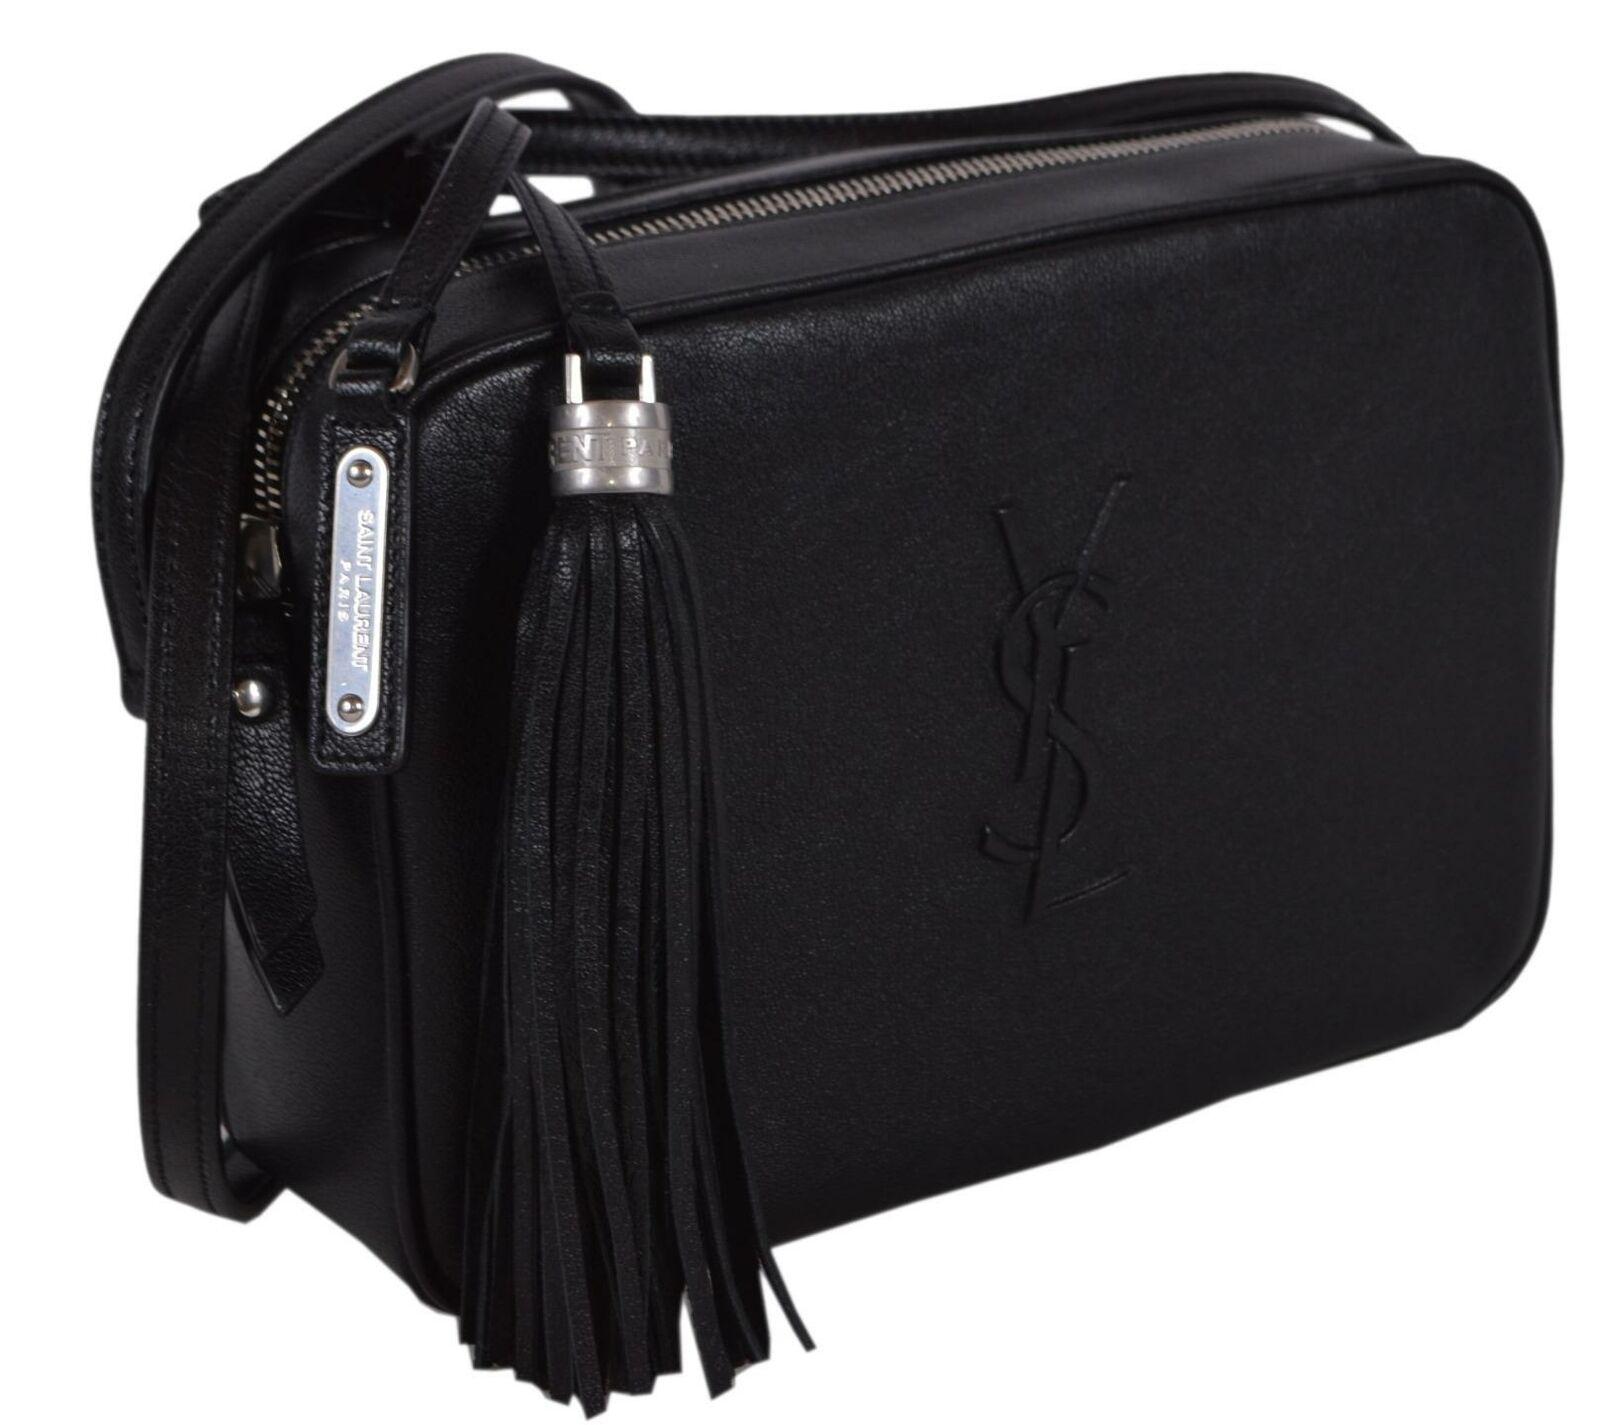 Saint Laurent Ysl Monogram Lou Camera Tassel Crossbody Shoulder Bag Black Tulip For Sale Online Ebay